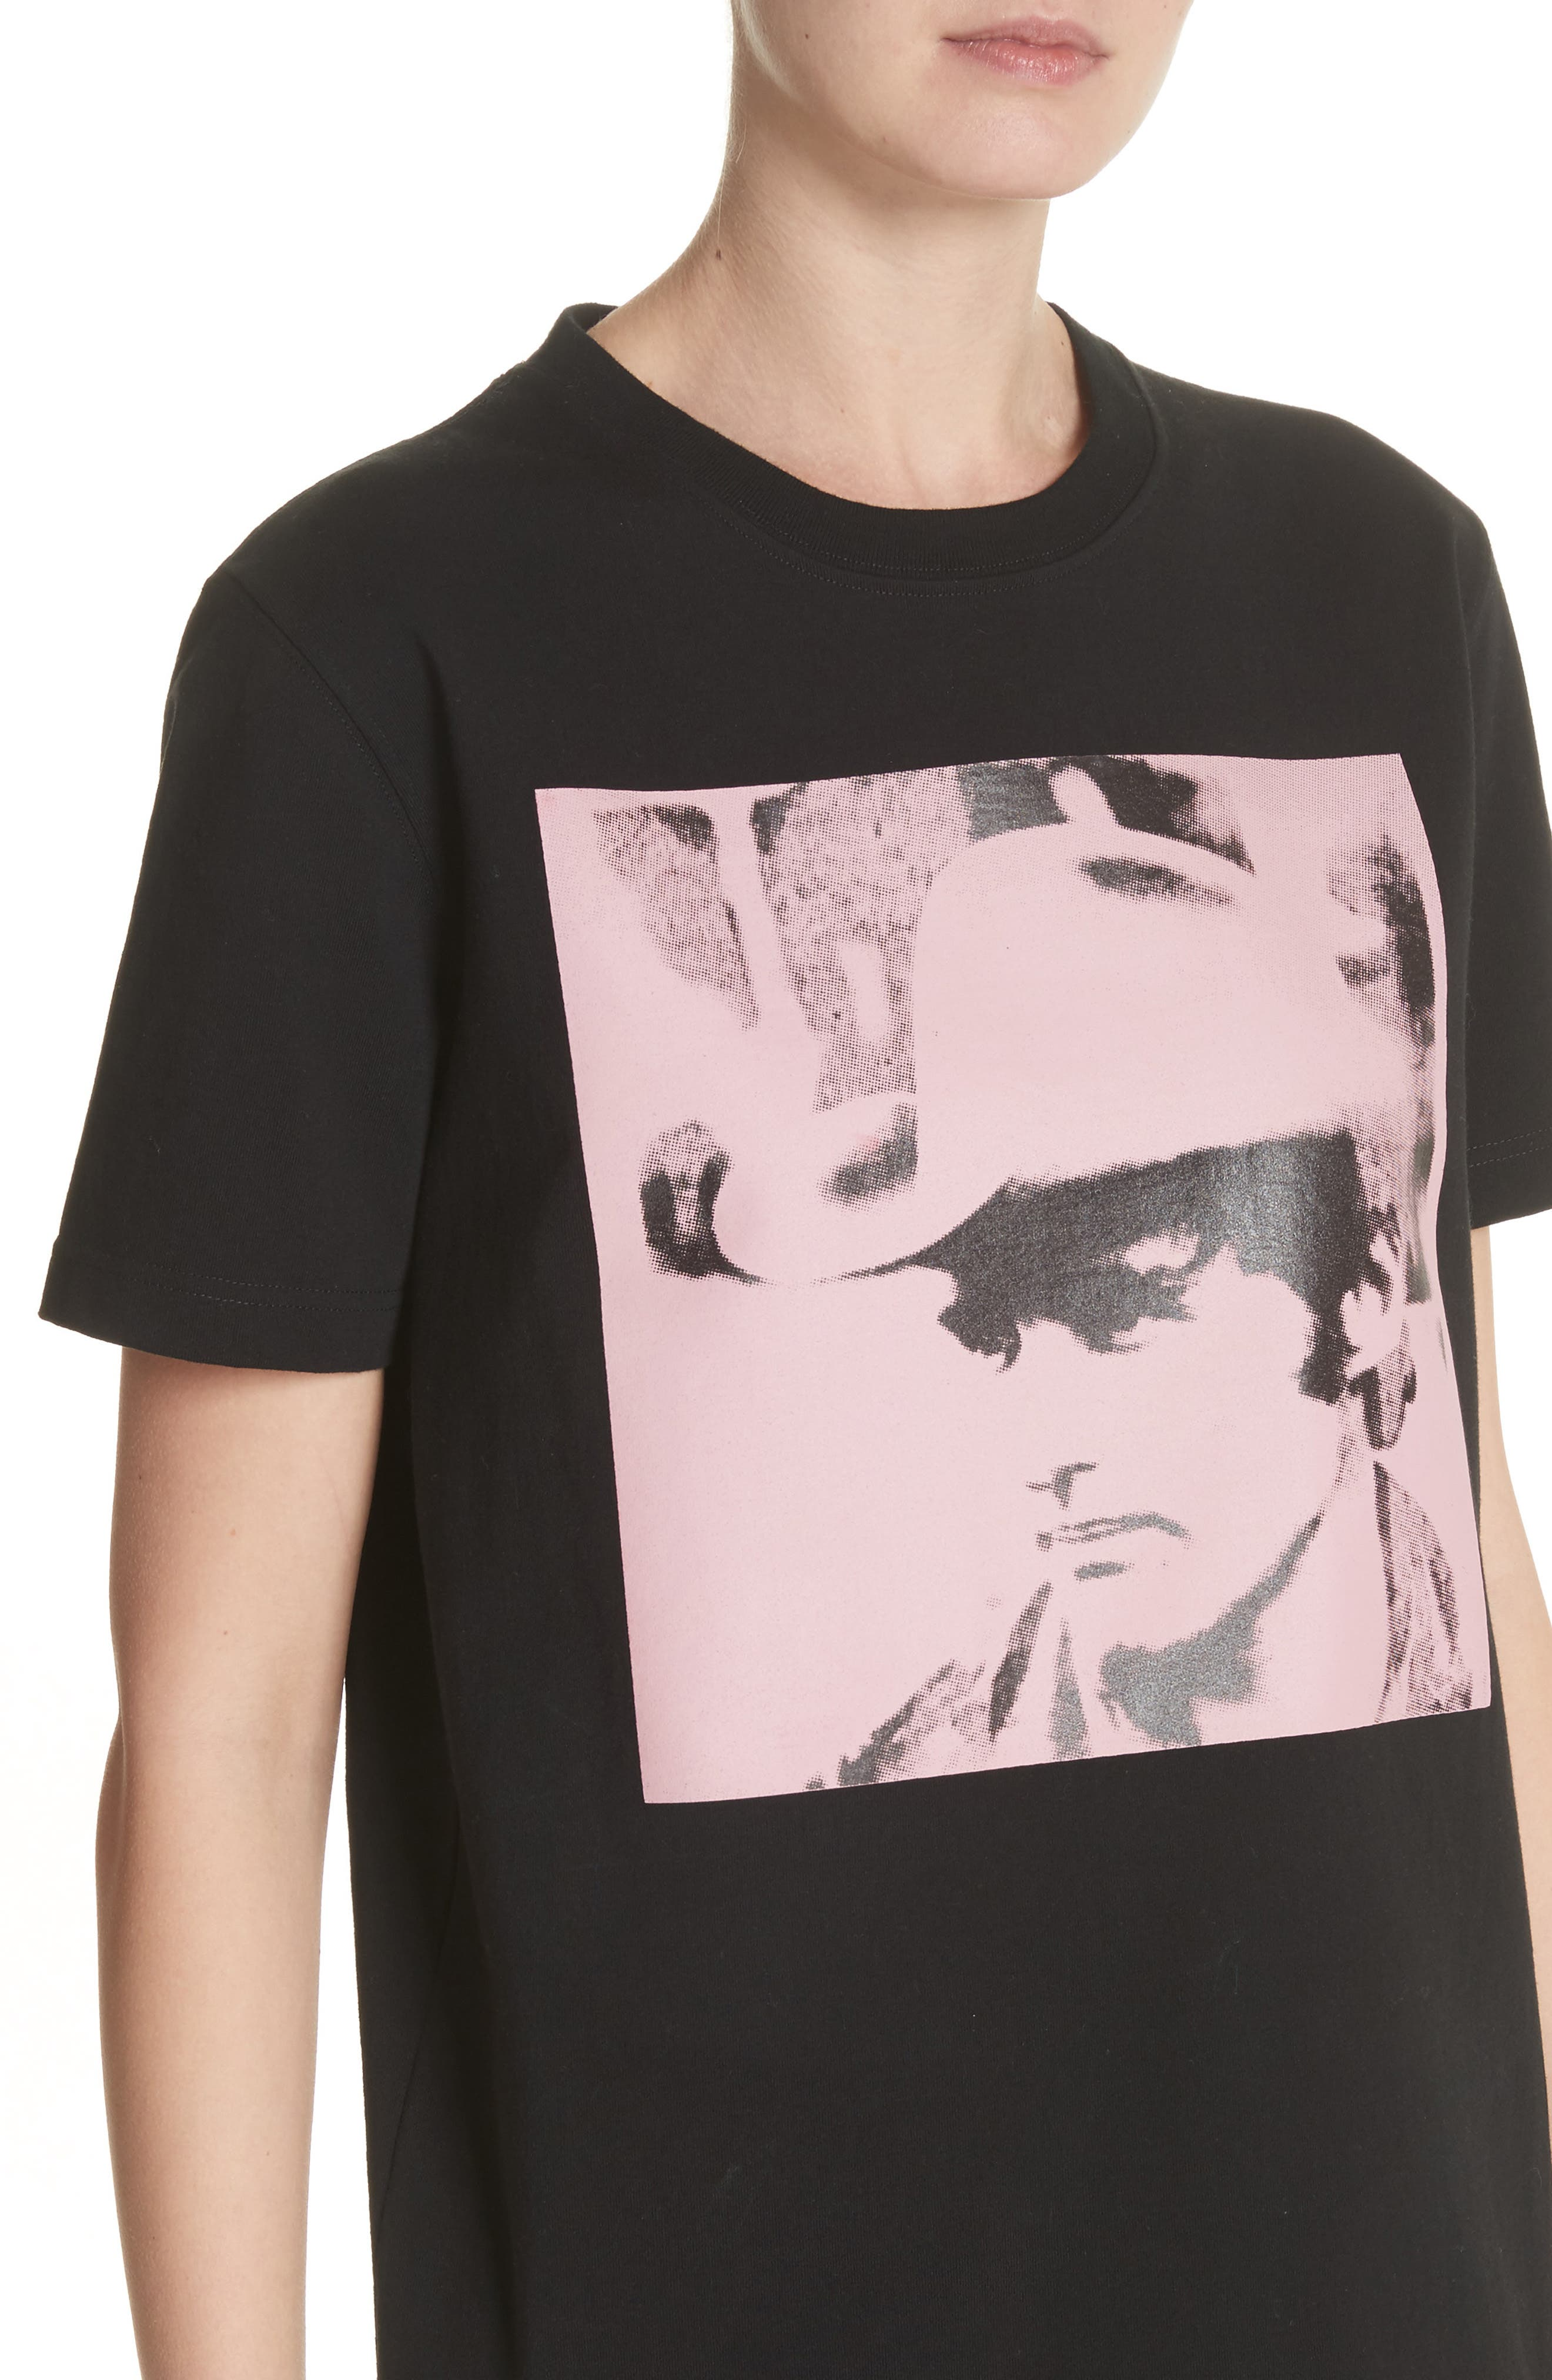 x Andy Warhol Foundation Dennis Hopper Tee,                             Alternate thumbnail 4, color,                             005